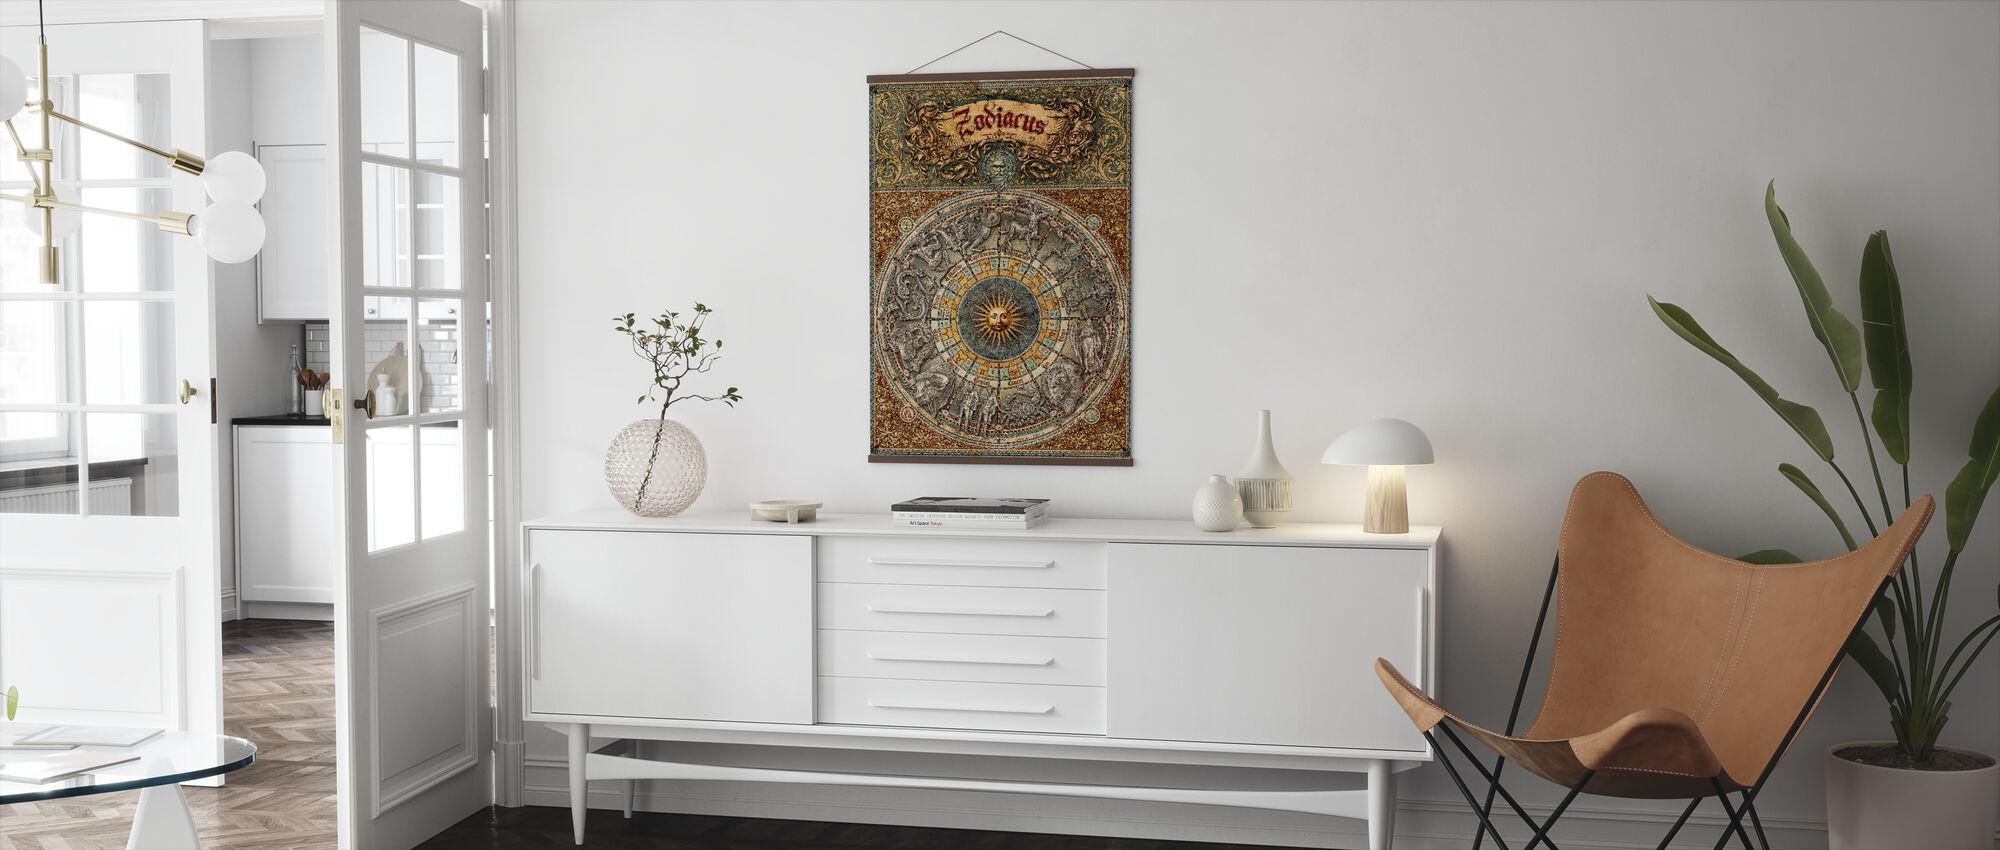 Zodiac - Poster - Vardagsrum